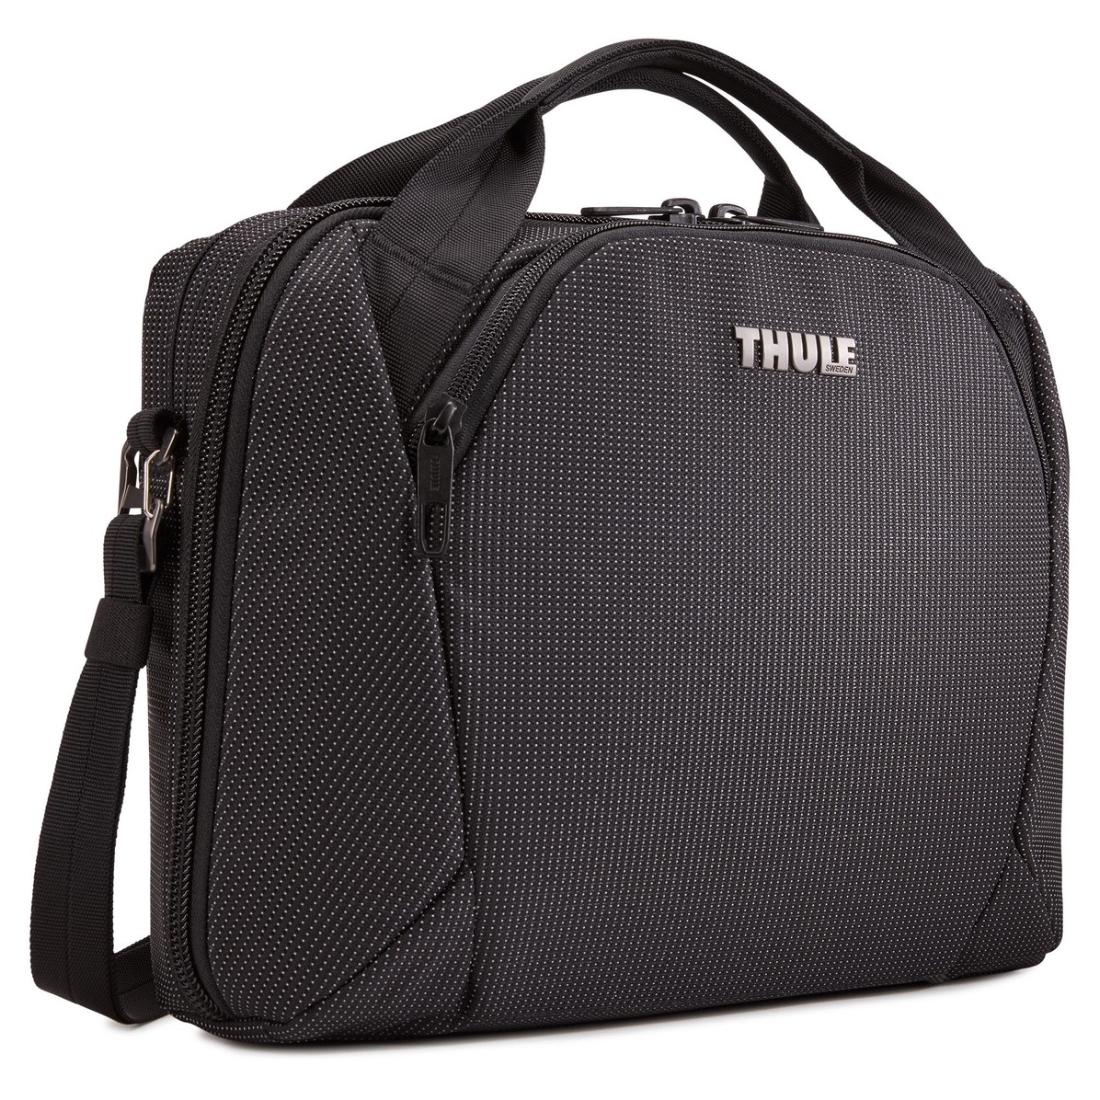 3203843 Thule Crossover 2 Laptop Bag 13.3 Black Inc